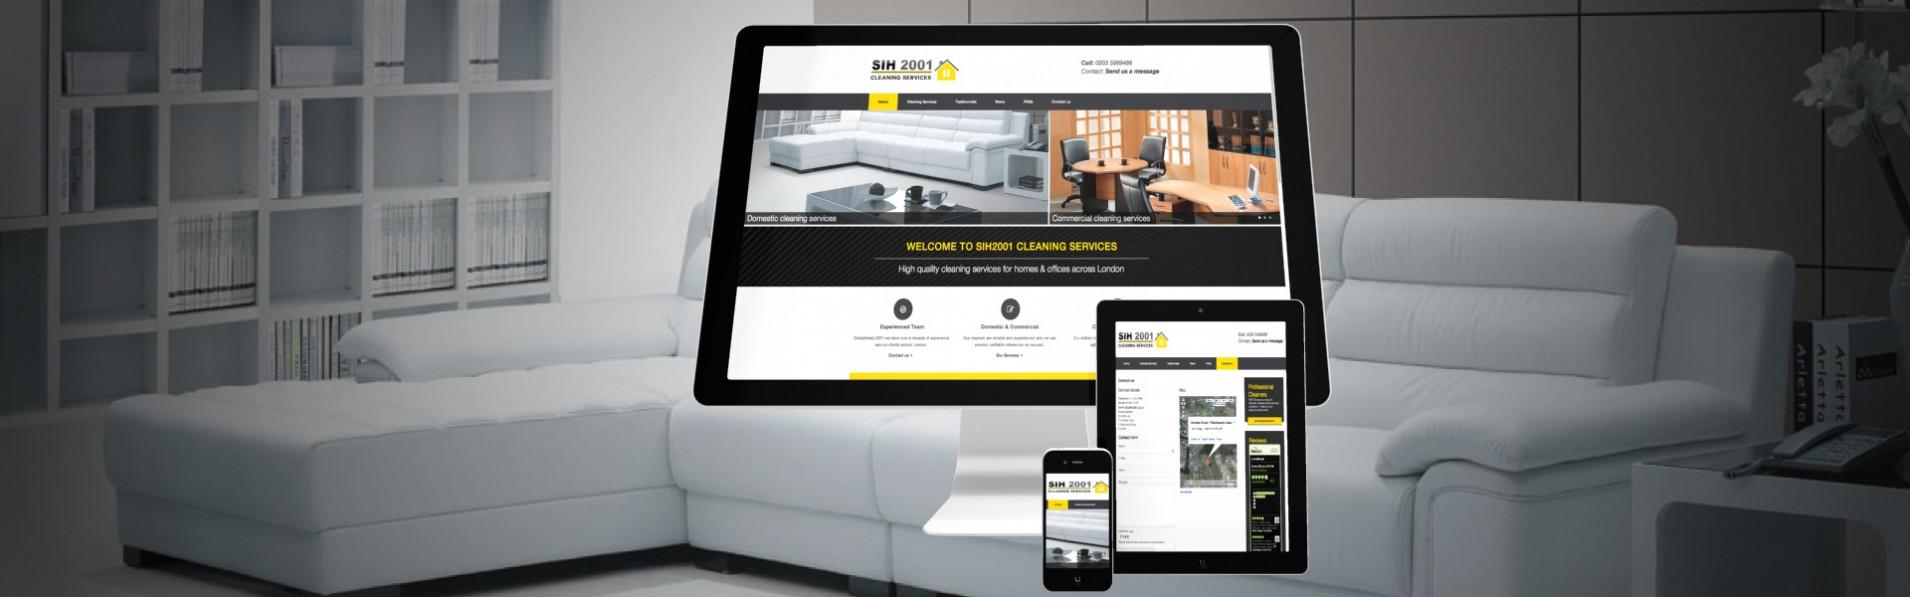 portfolio new1 SIH - Web design for interior design business